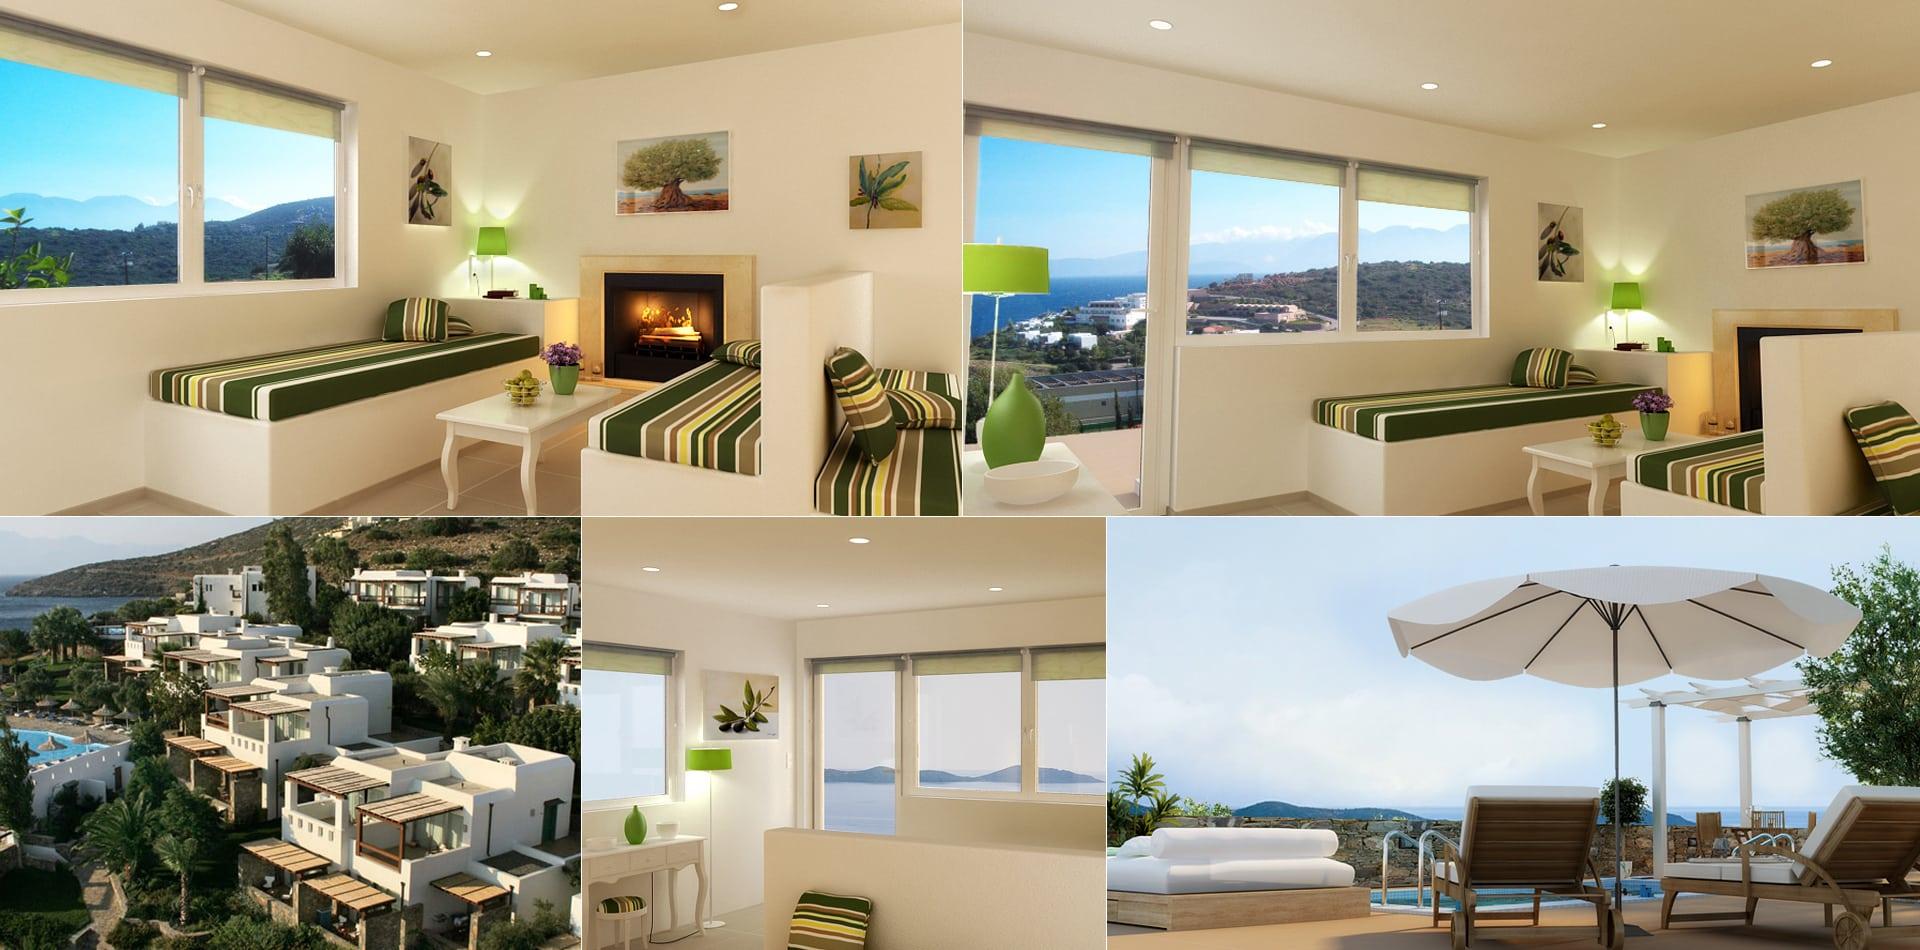 3d Interior Exterior Design Crete Elounda Bungalows